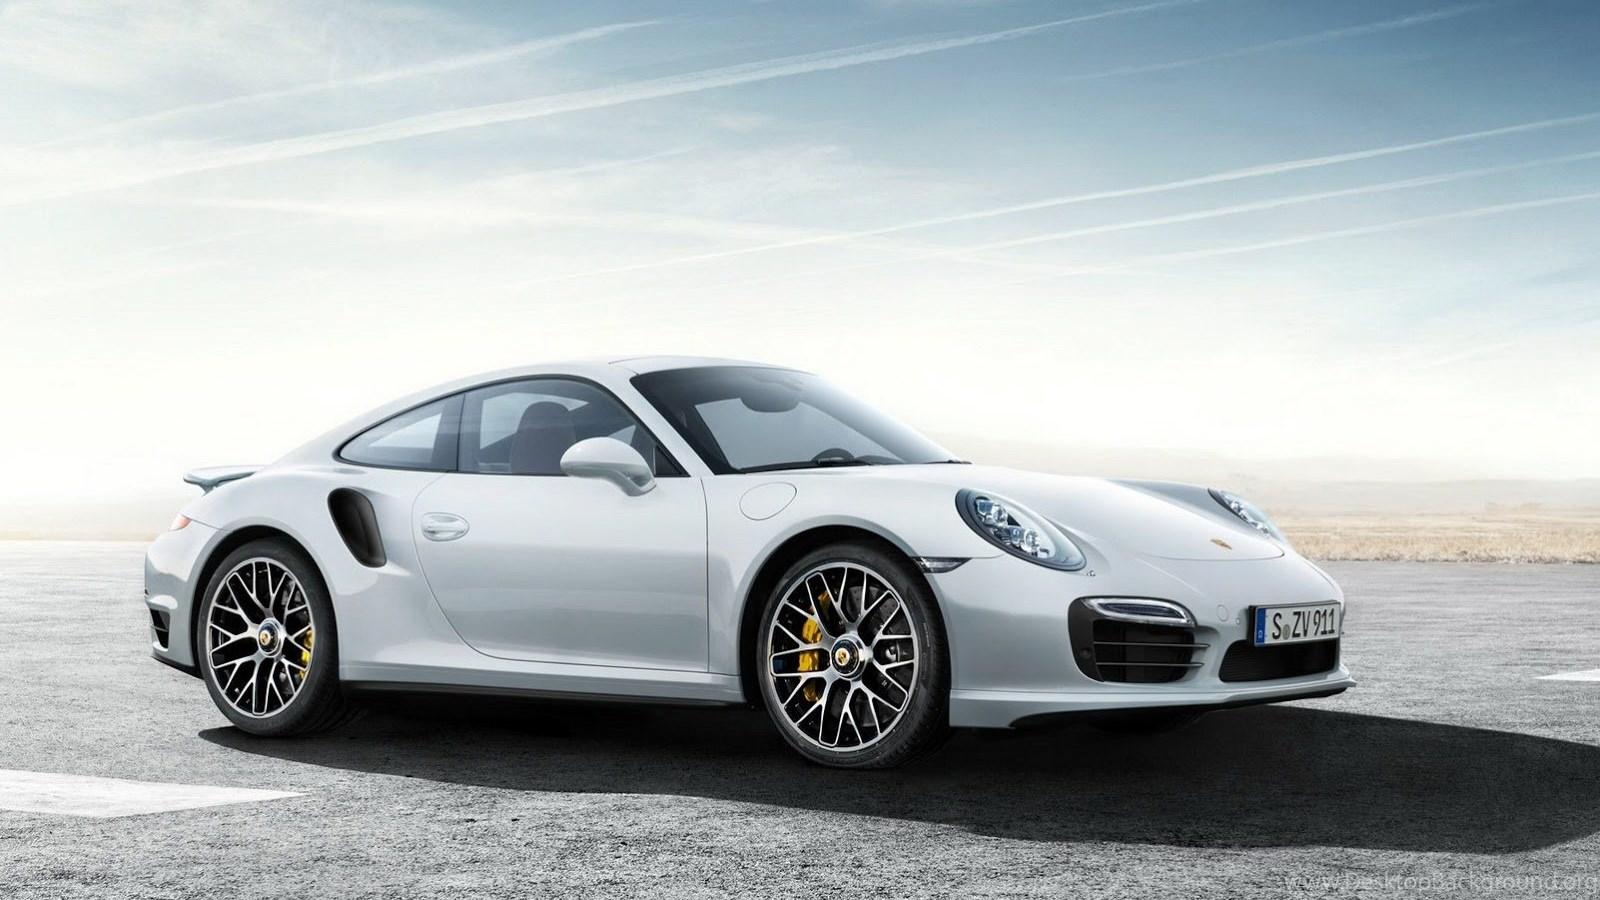 Porsche 911 Turbo S 4 Cool Wallpapers Hivewallpaper Com Desktop